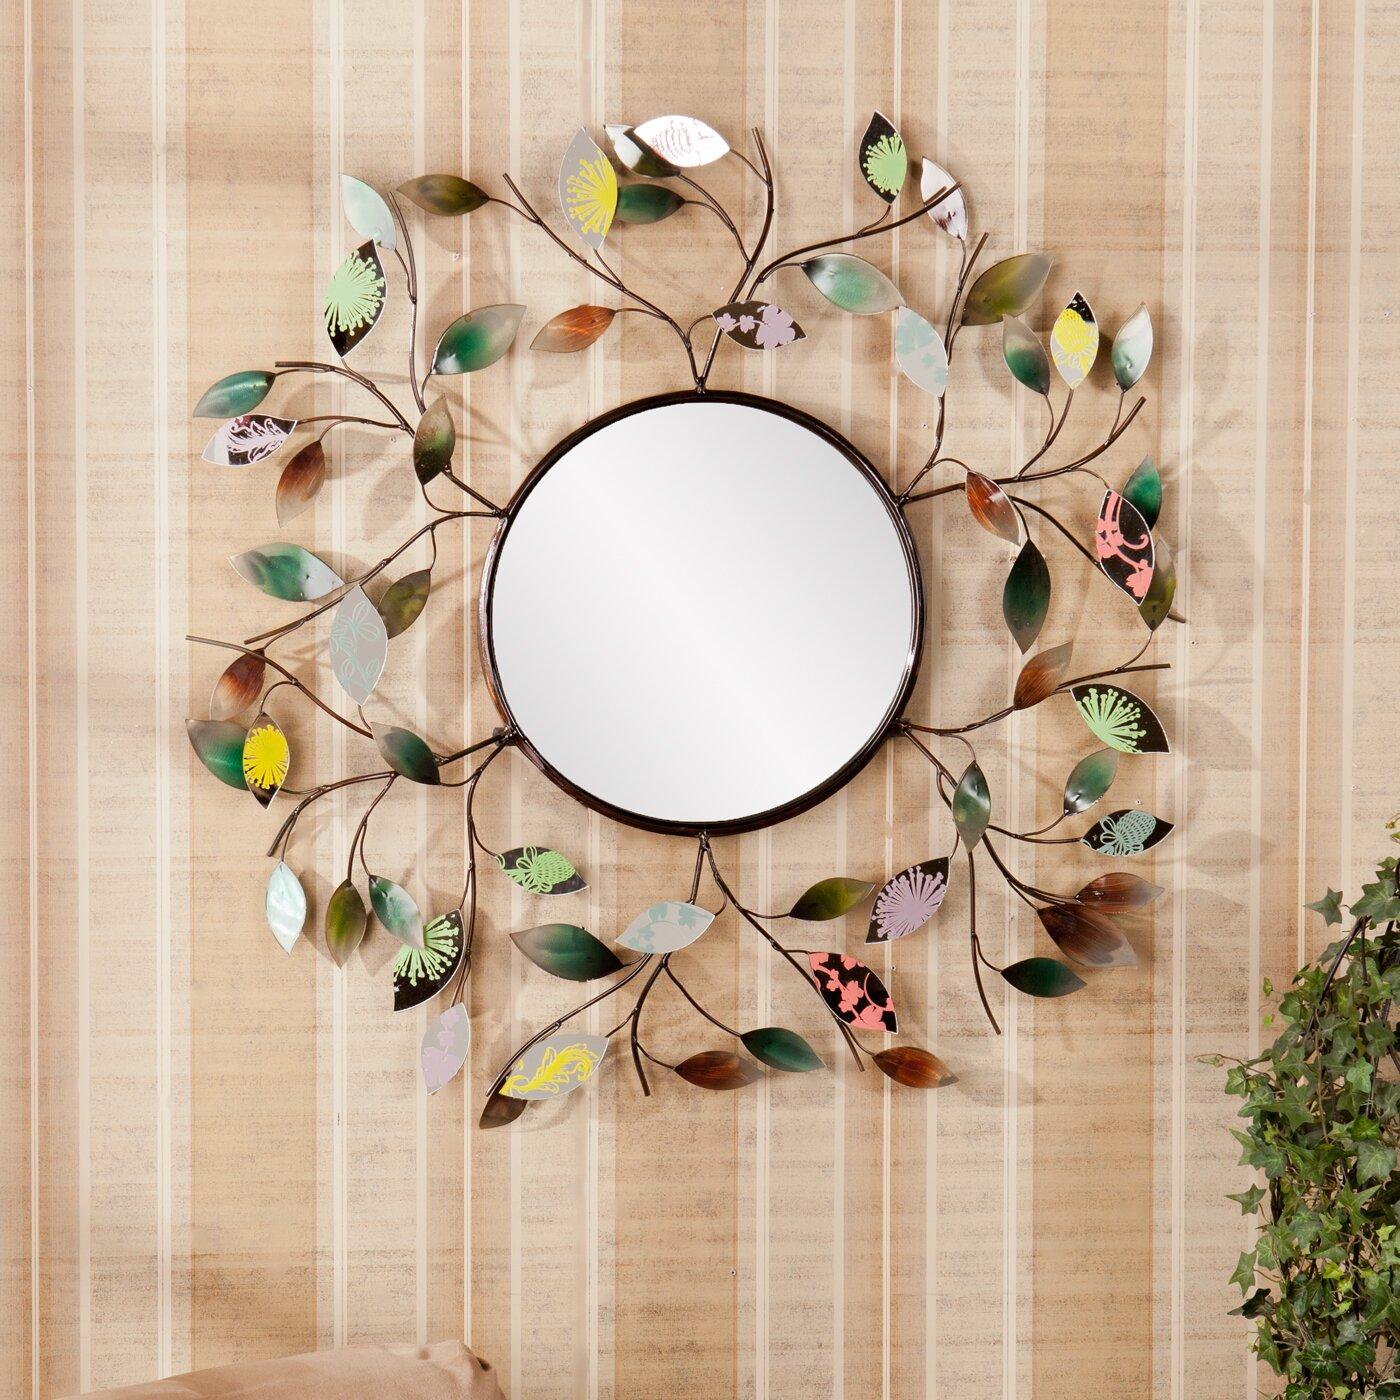 Red Barrel Studio Decorative Metallic Leaf Wall Mirror ...